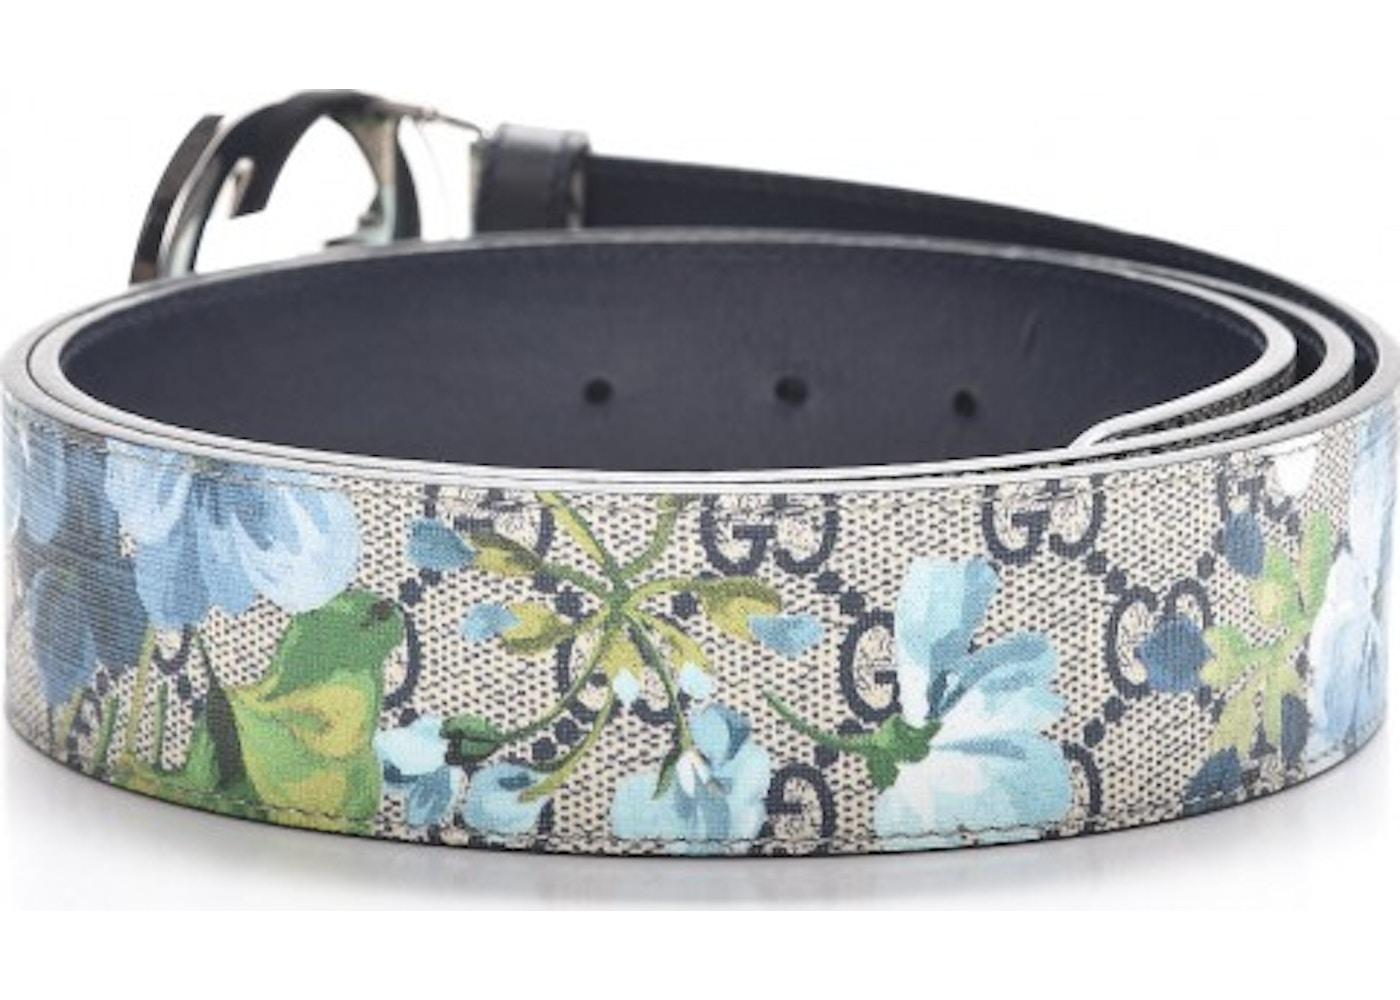 71d8c1b72 Gucci Blooms Belt GG Supreme Monogram Beige/Blue